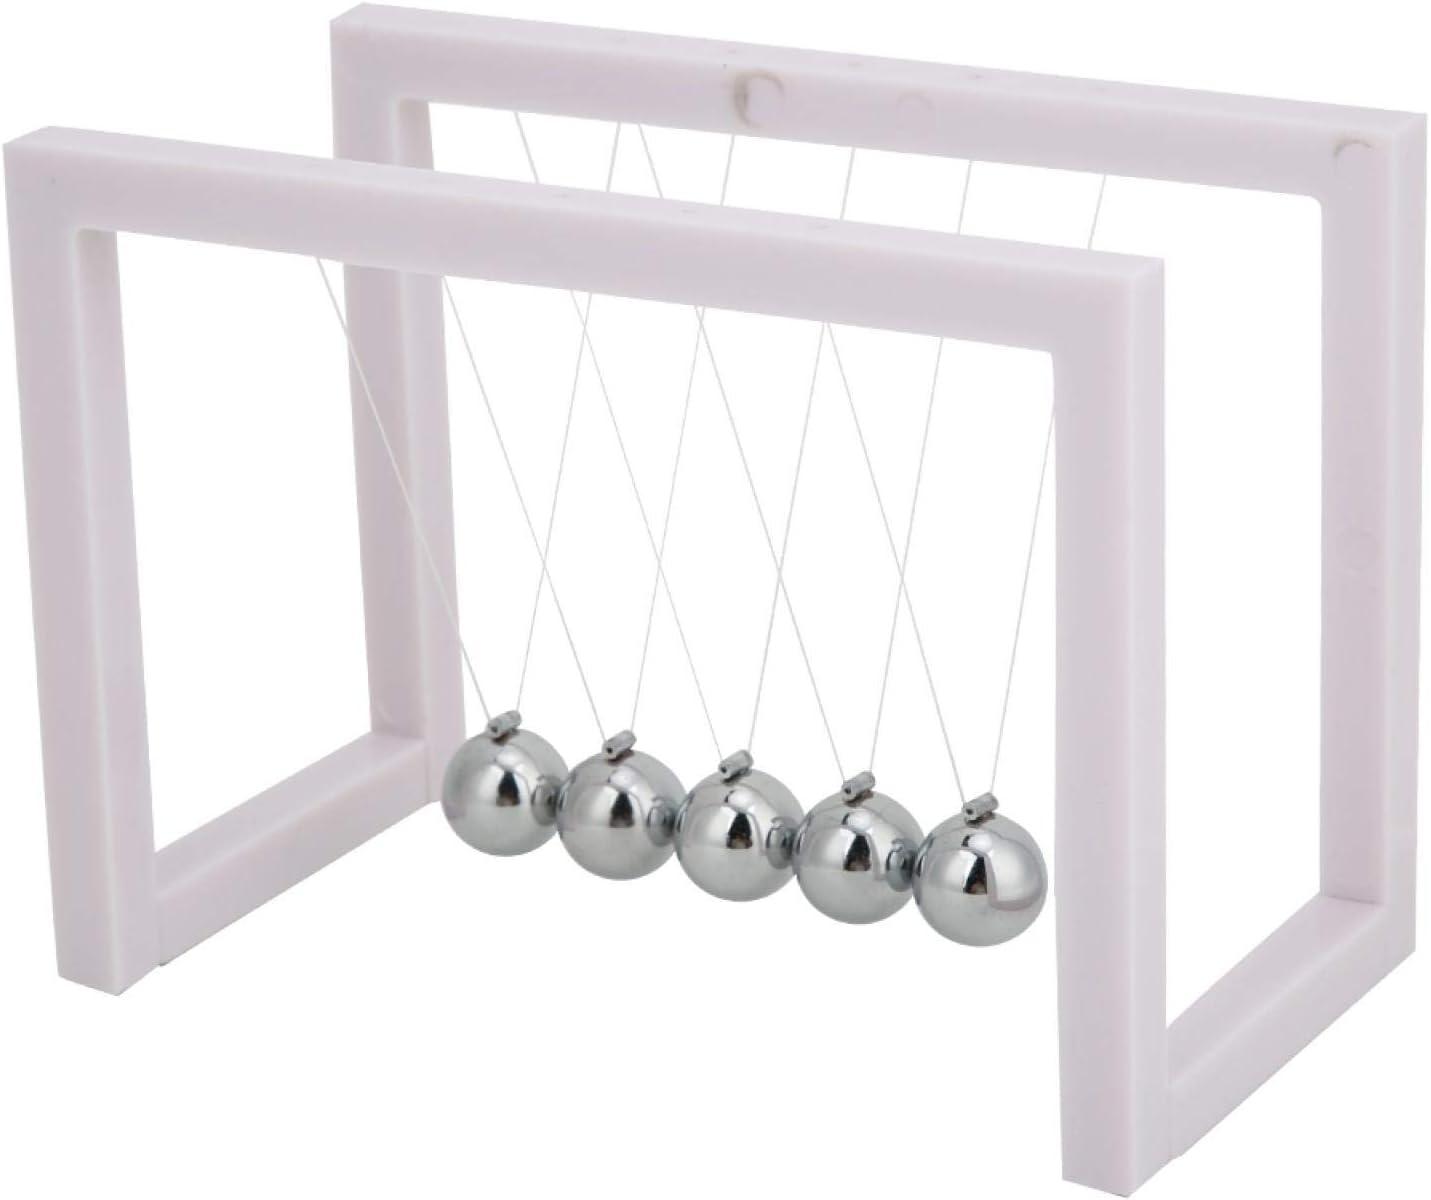 A sixx Pendulum Ball, Solid Steel Ball Sturdy White Pendulum Balls, for Home Office Gifts Desk